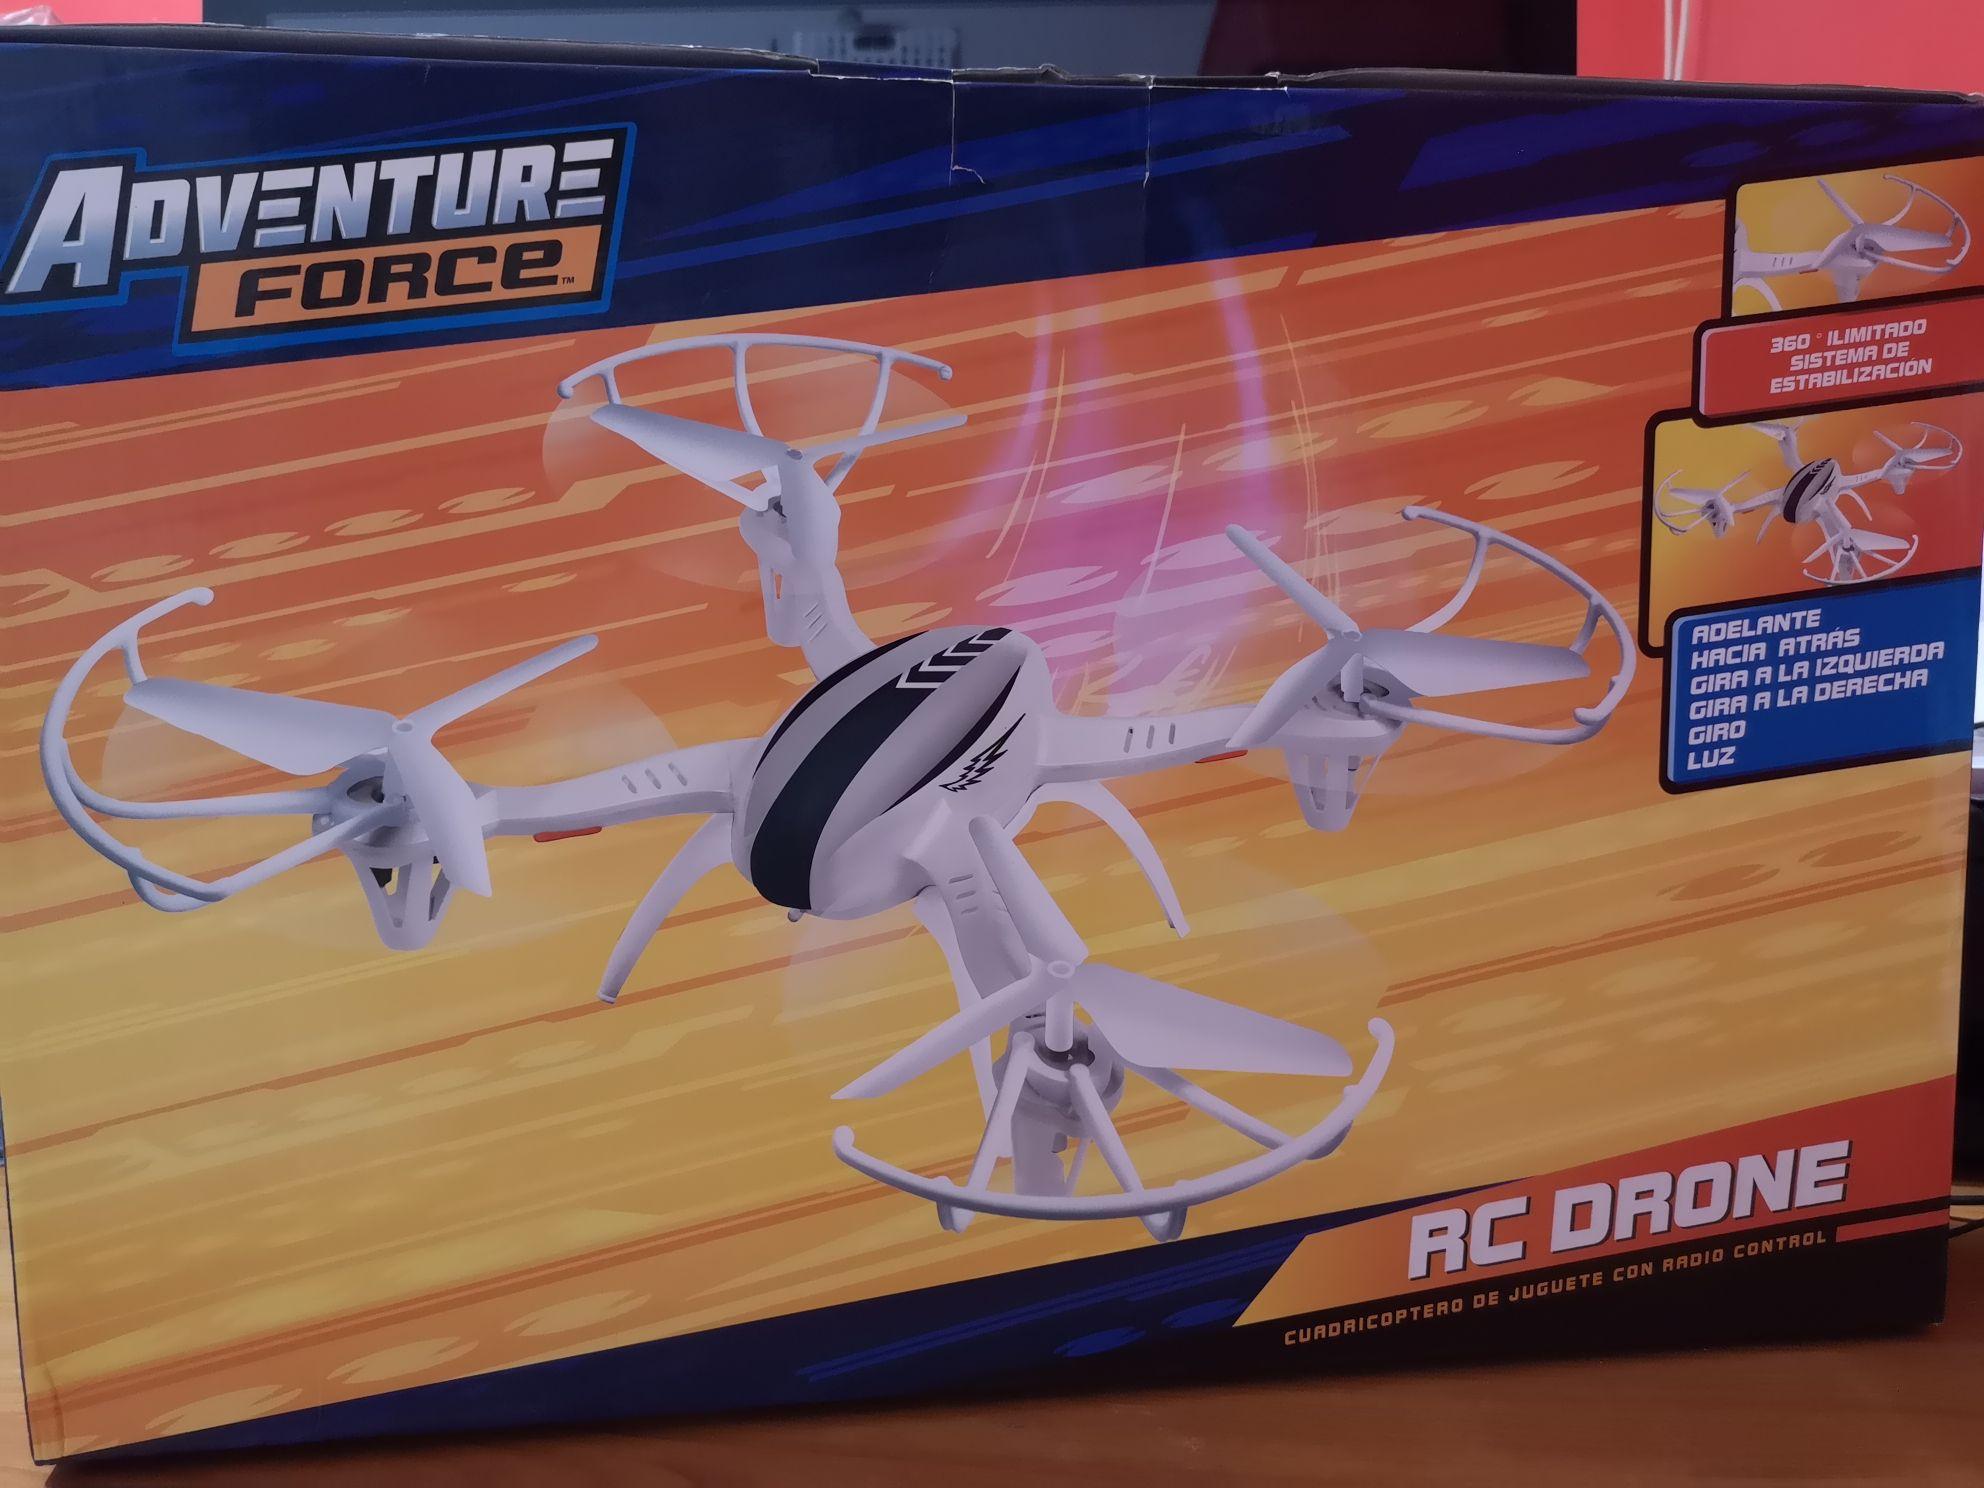 Bodega Aurrerá: Drone Rc Adventure Force.